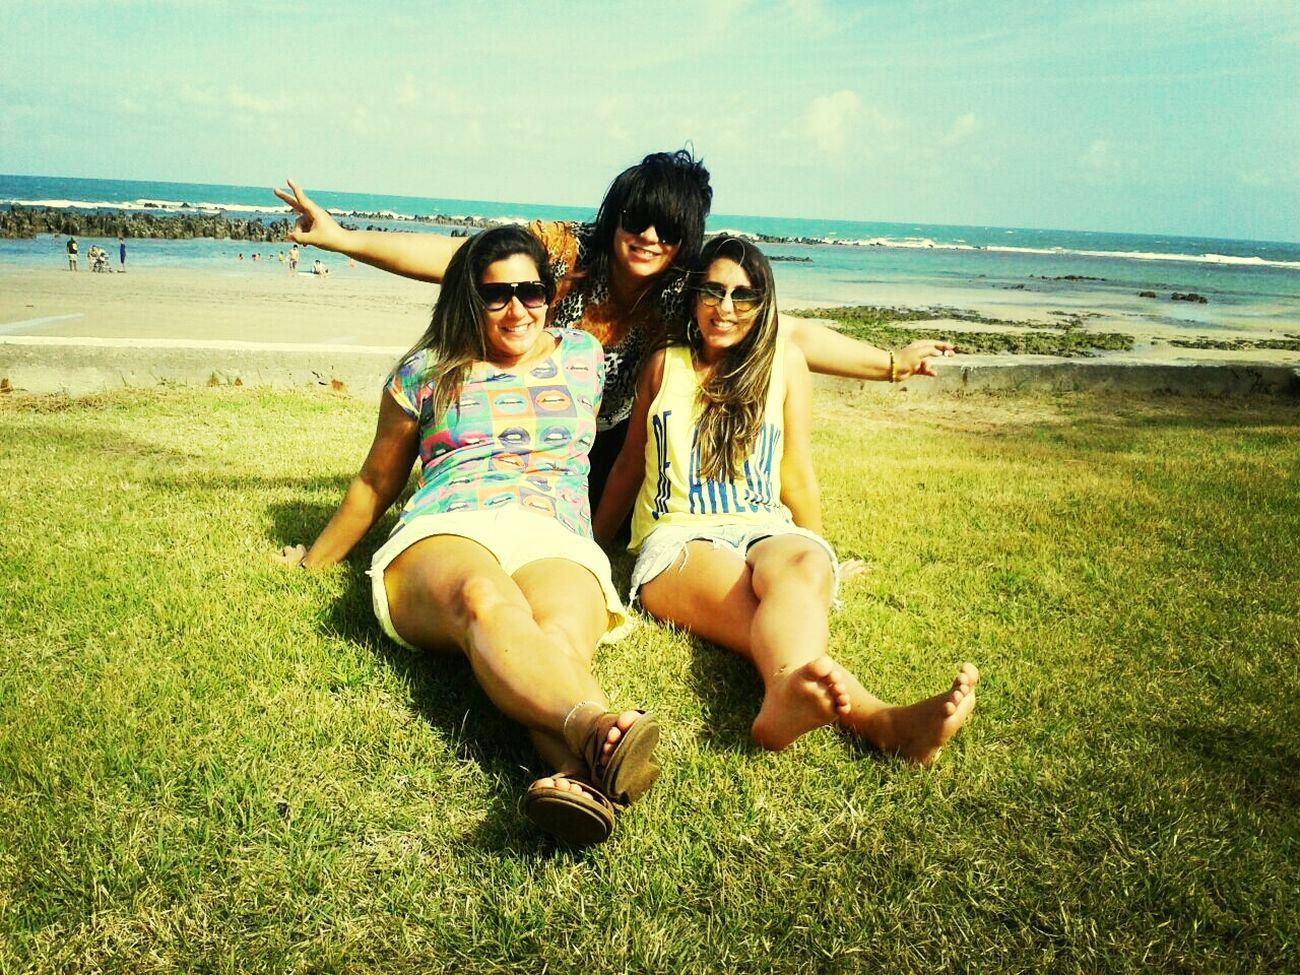 Relaxing Beach Day Celebration Sun